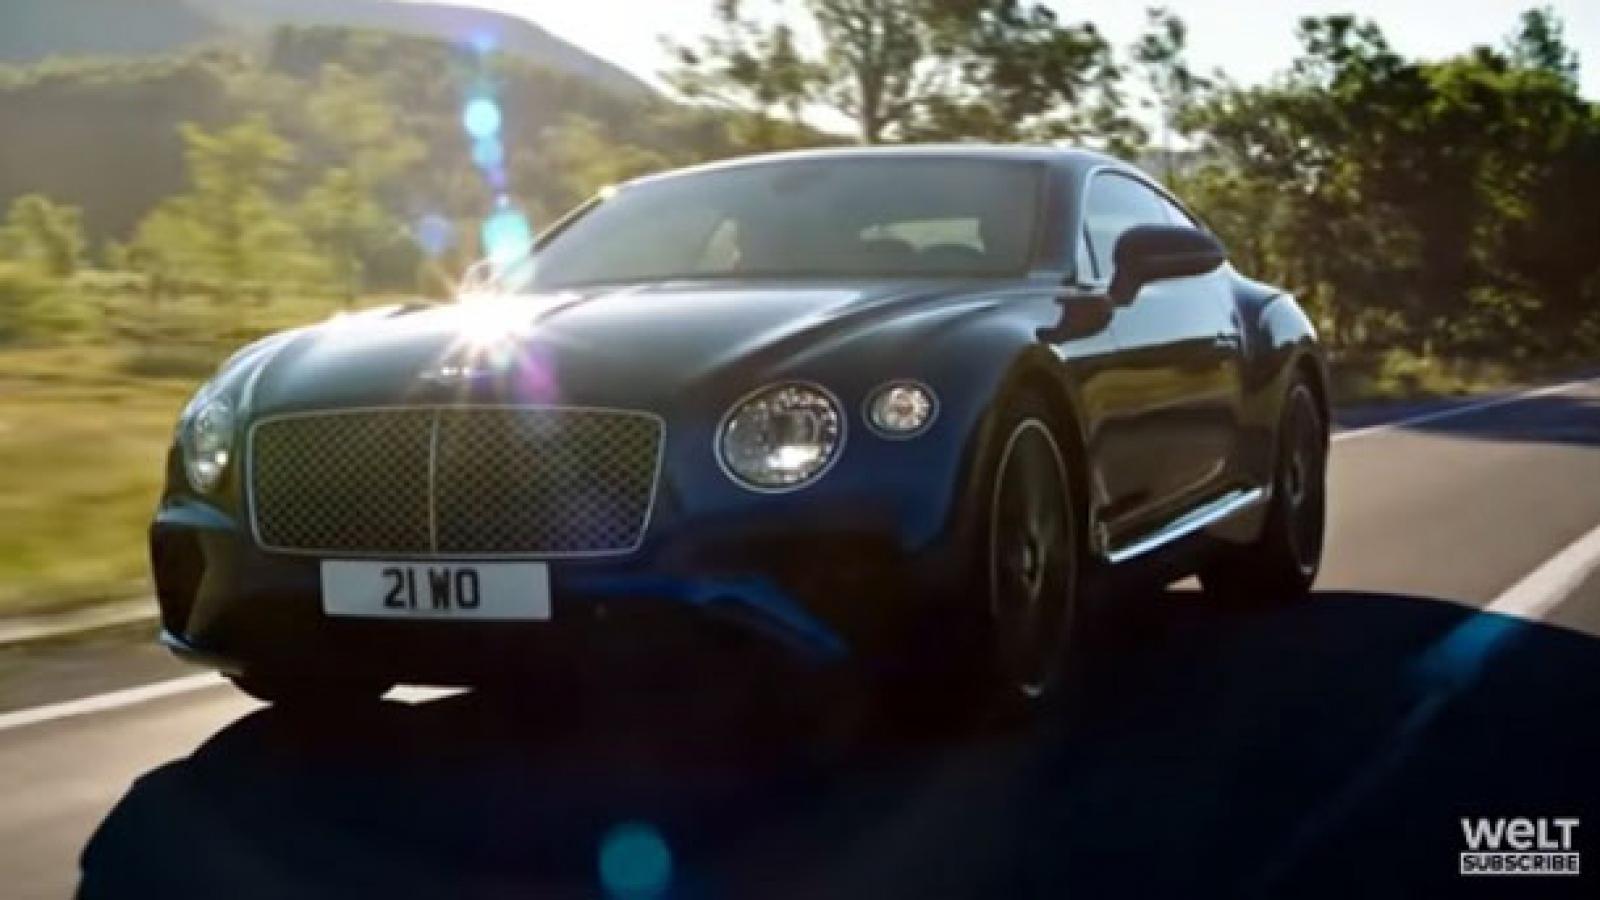 Video: Khám phá nhà máy lắp ráp Bentley Continental GT